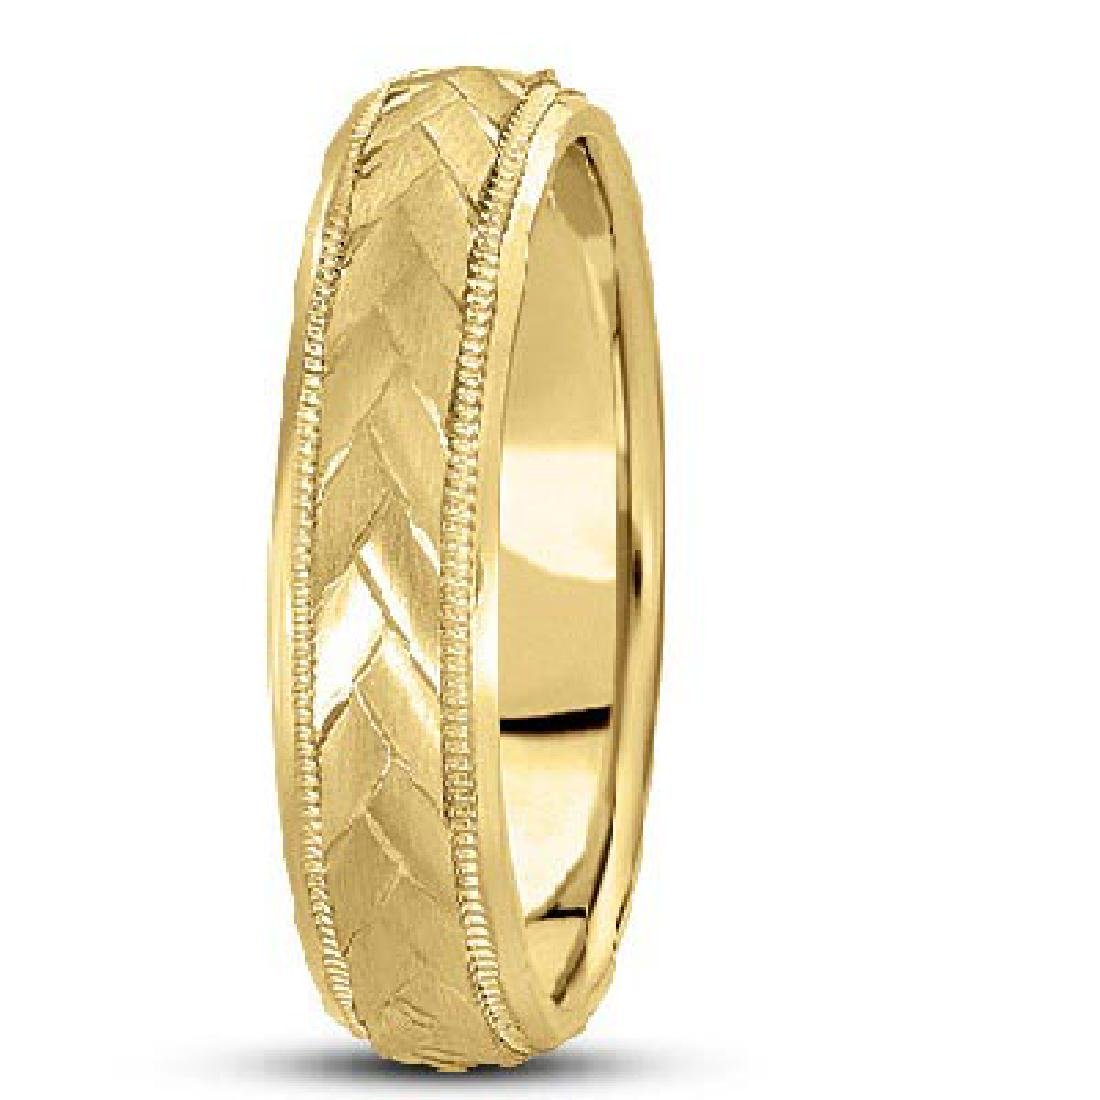 Braided Mens Wedding Ring Diamond Cut Band 14k Yellow